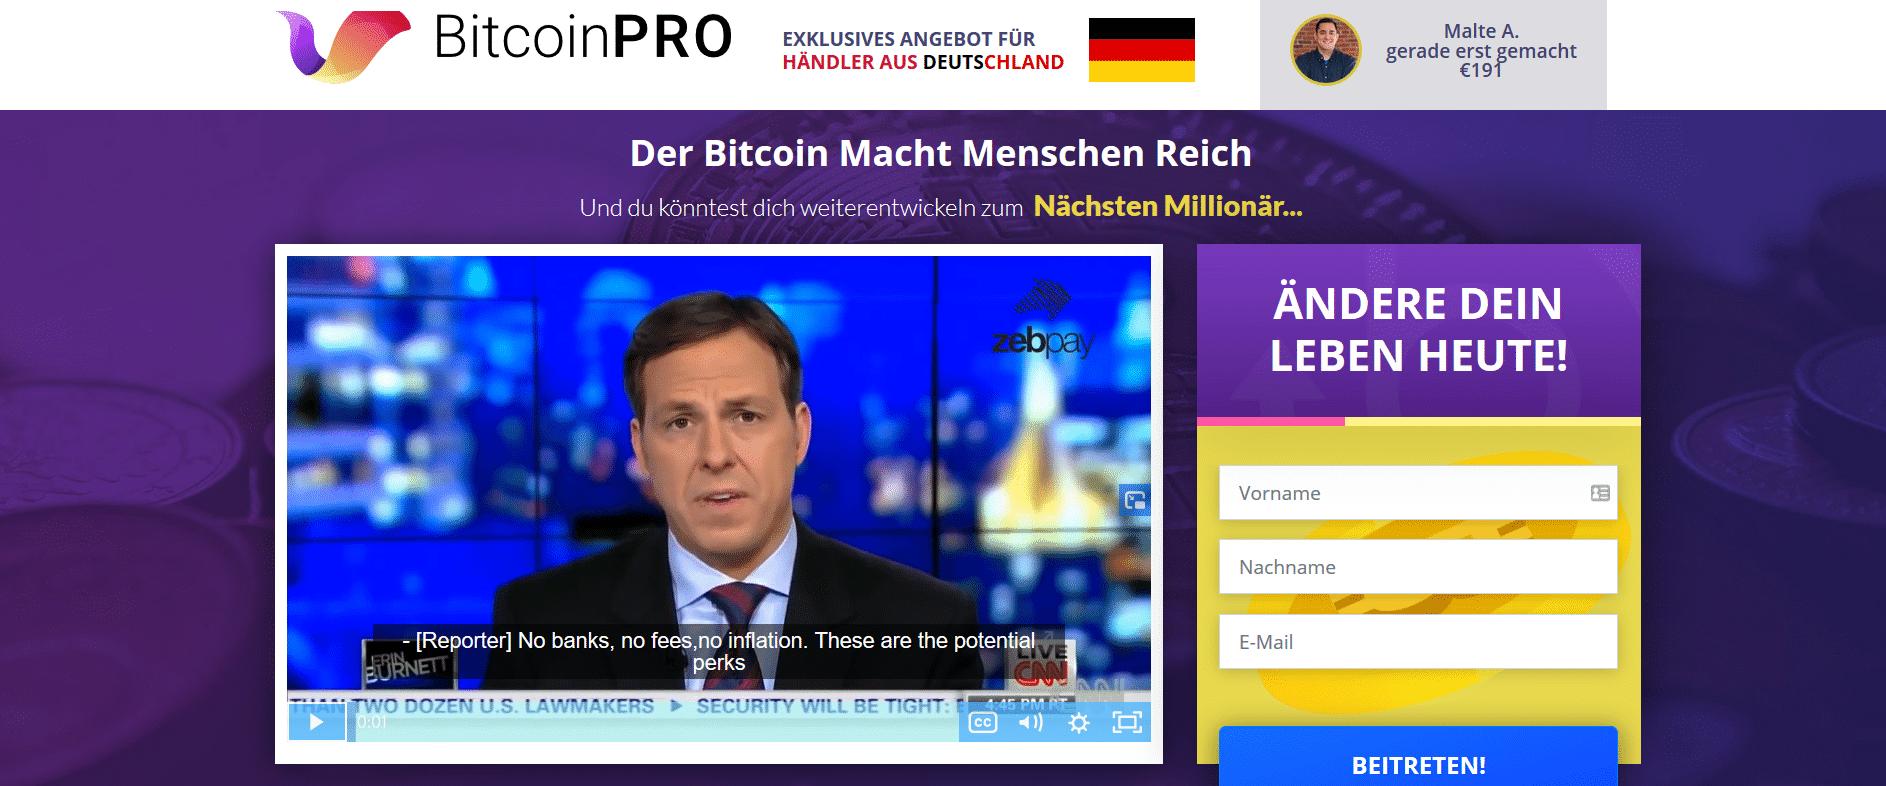 BitcoinPro (Bitcoin Pro) Homepage